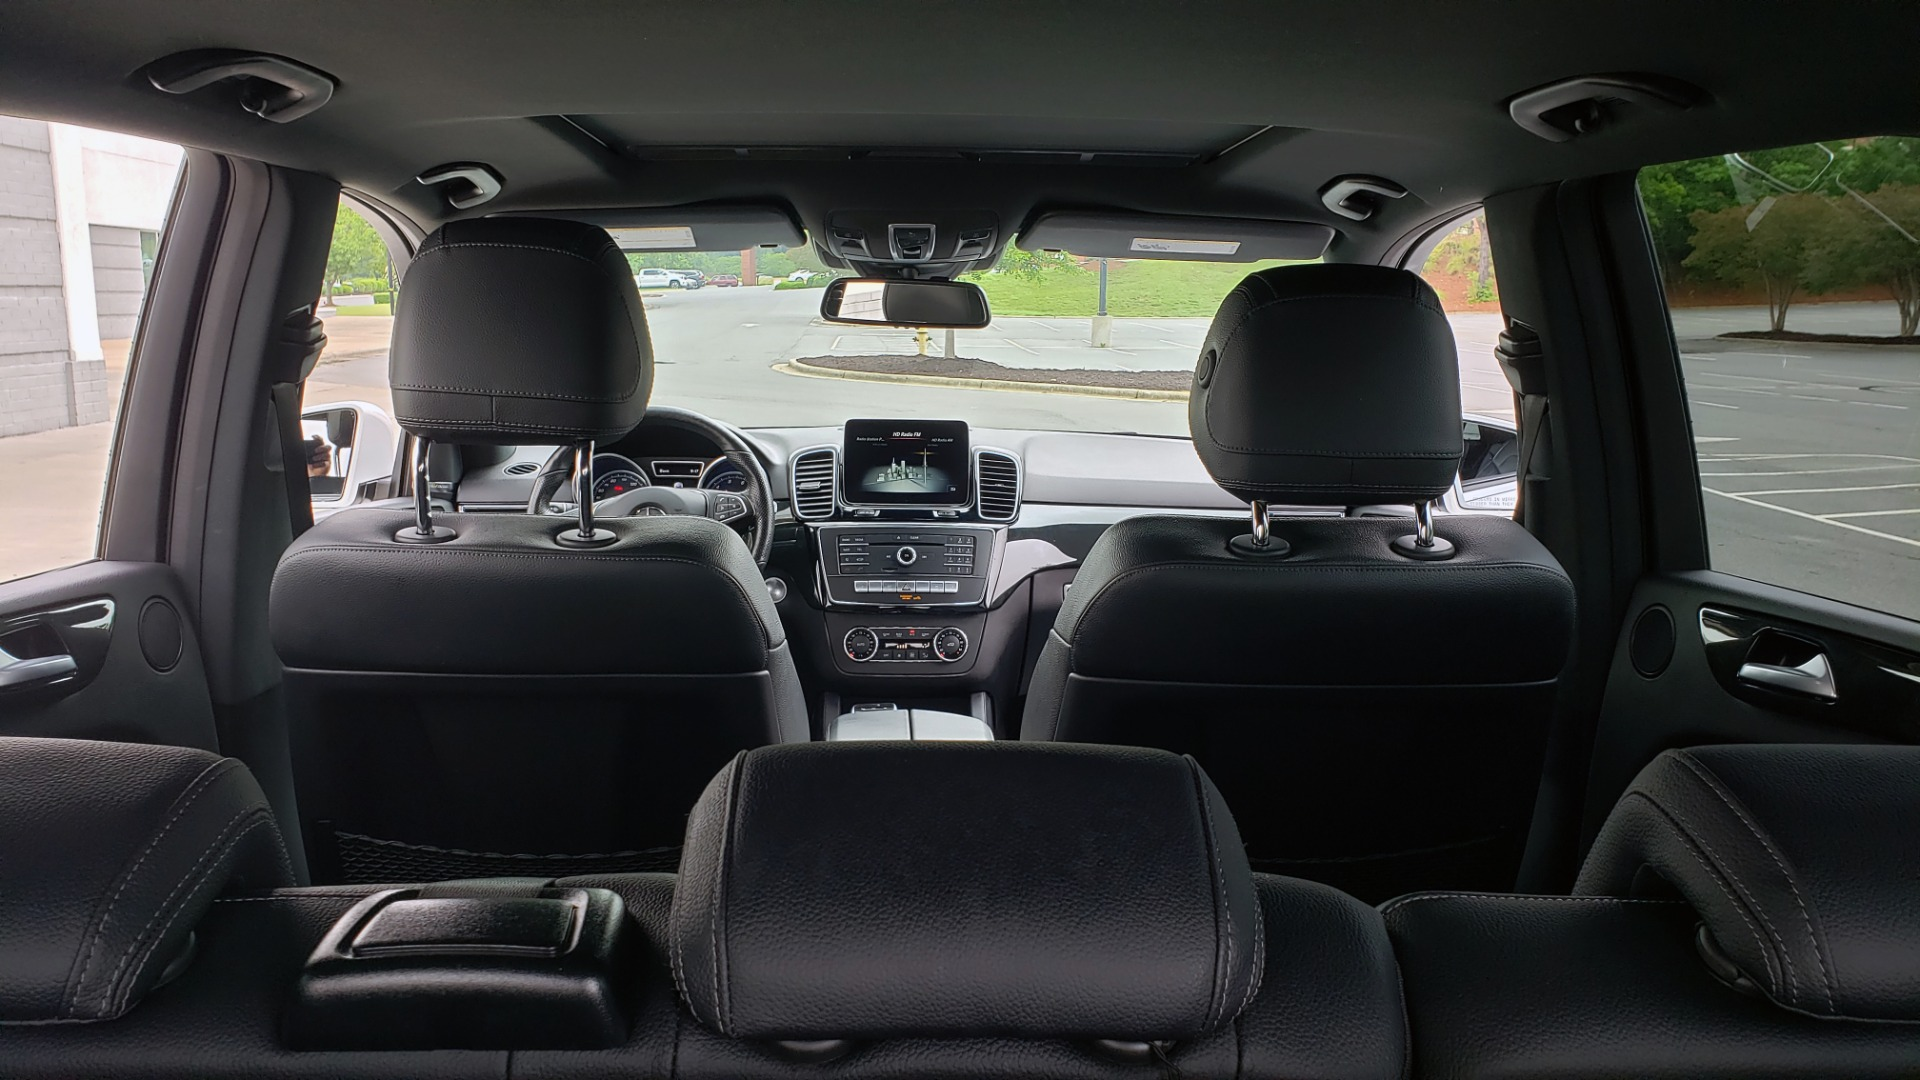 Used 2018 Mercedes-Benz GLE 350 4MATIC / PREM PKG / NAV / PARK ASST / K/H SND / HITCH / REARVIEW for sale $40,801 at Formula Imports in Charlotte NC 28227 18